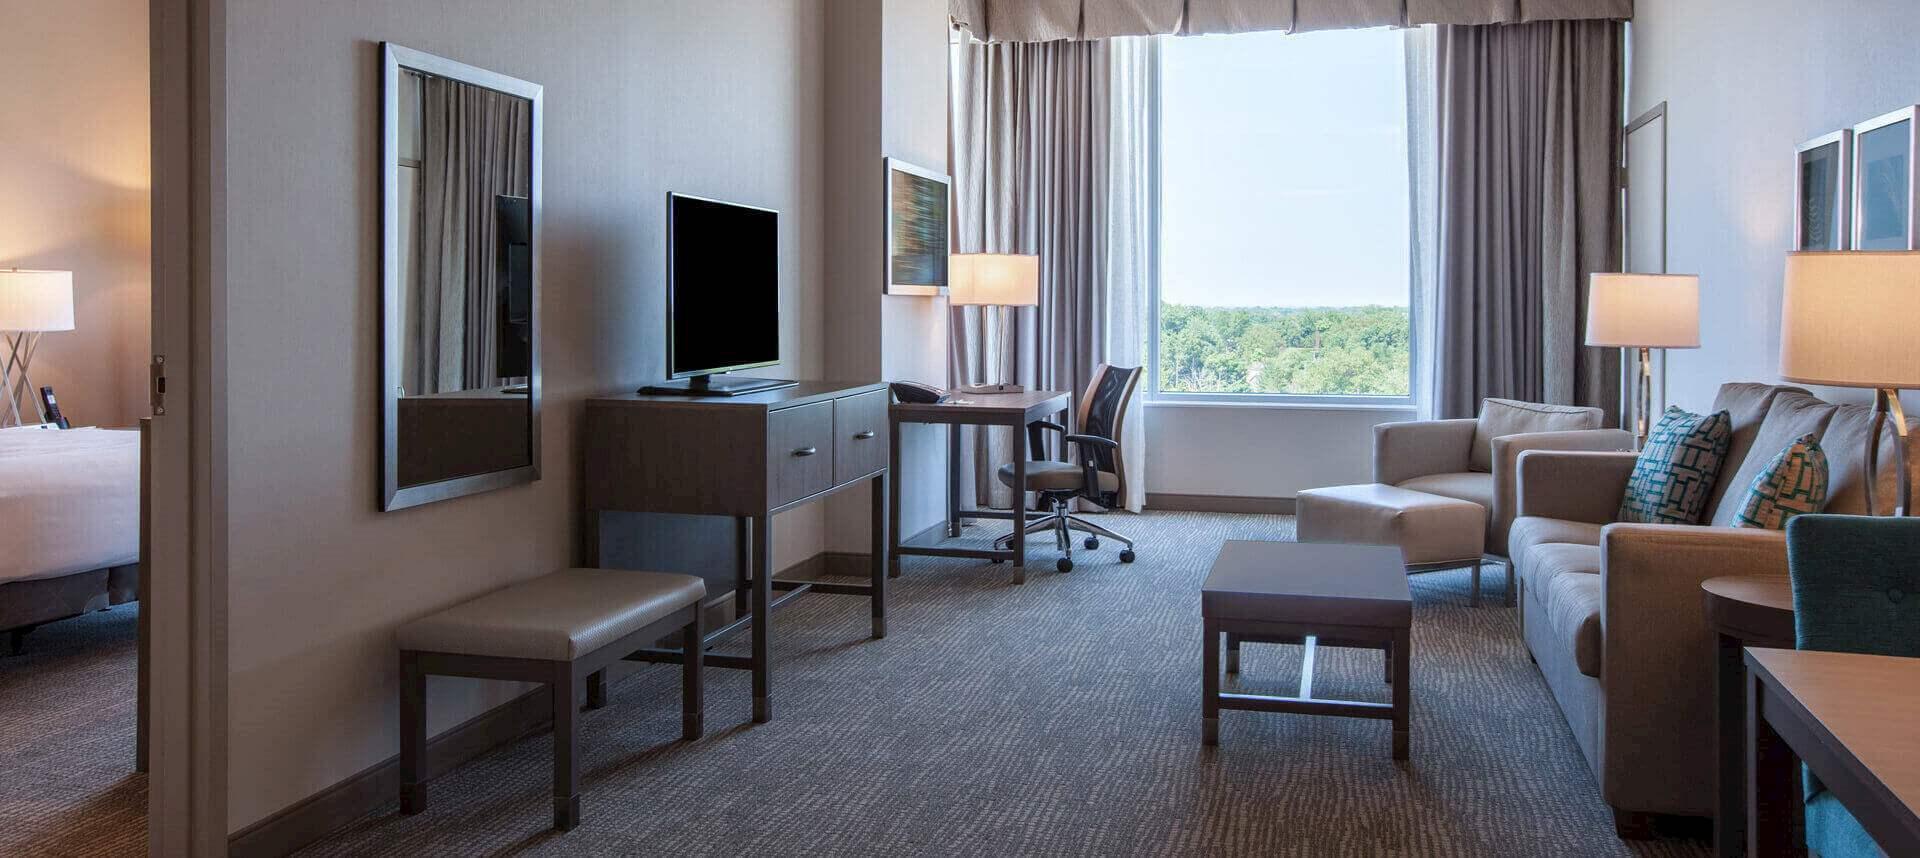 Holiday Inn Cleveland Clinic, Ohio